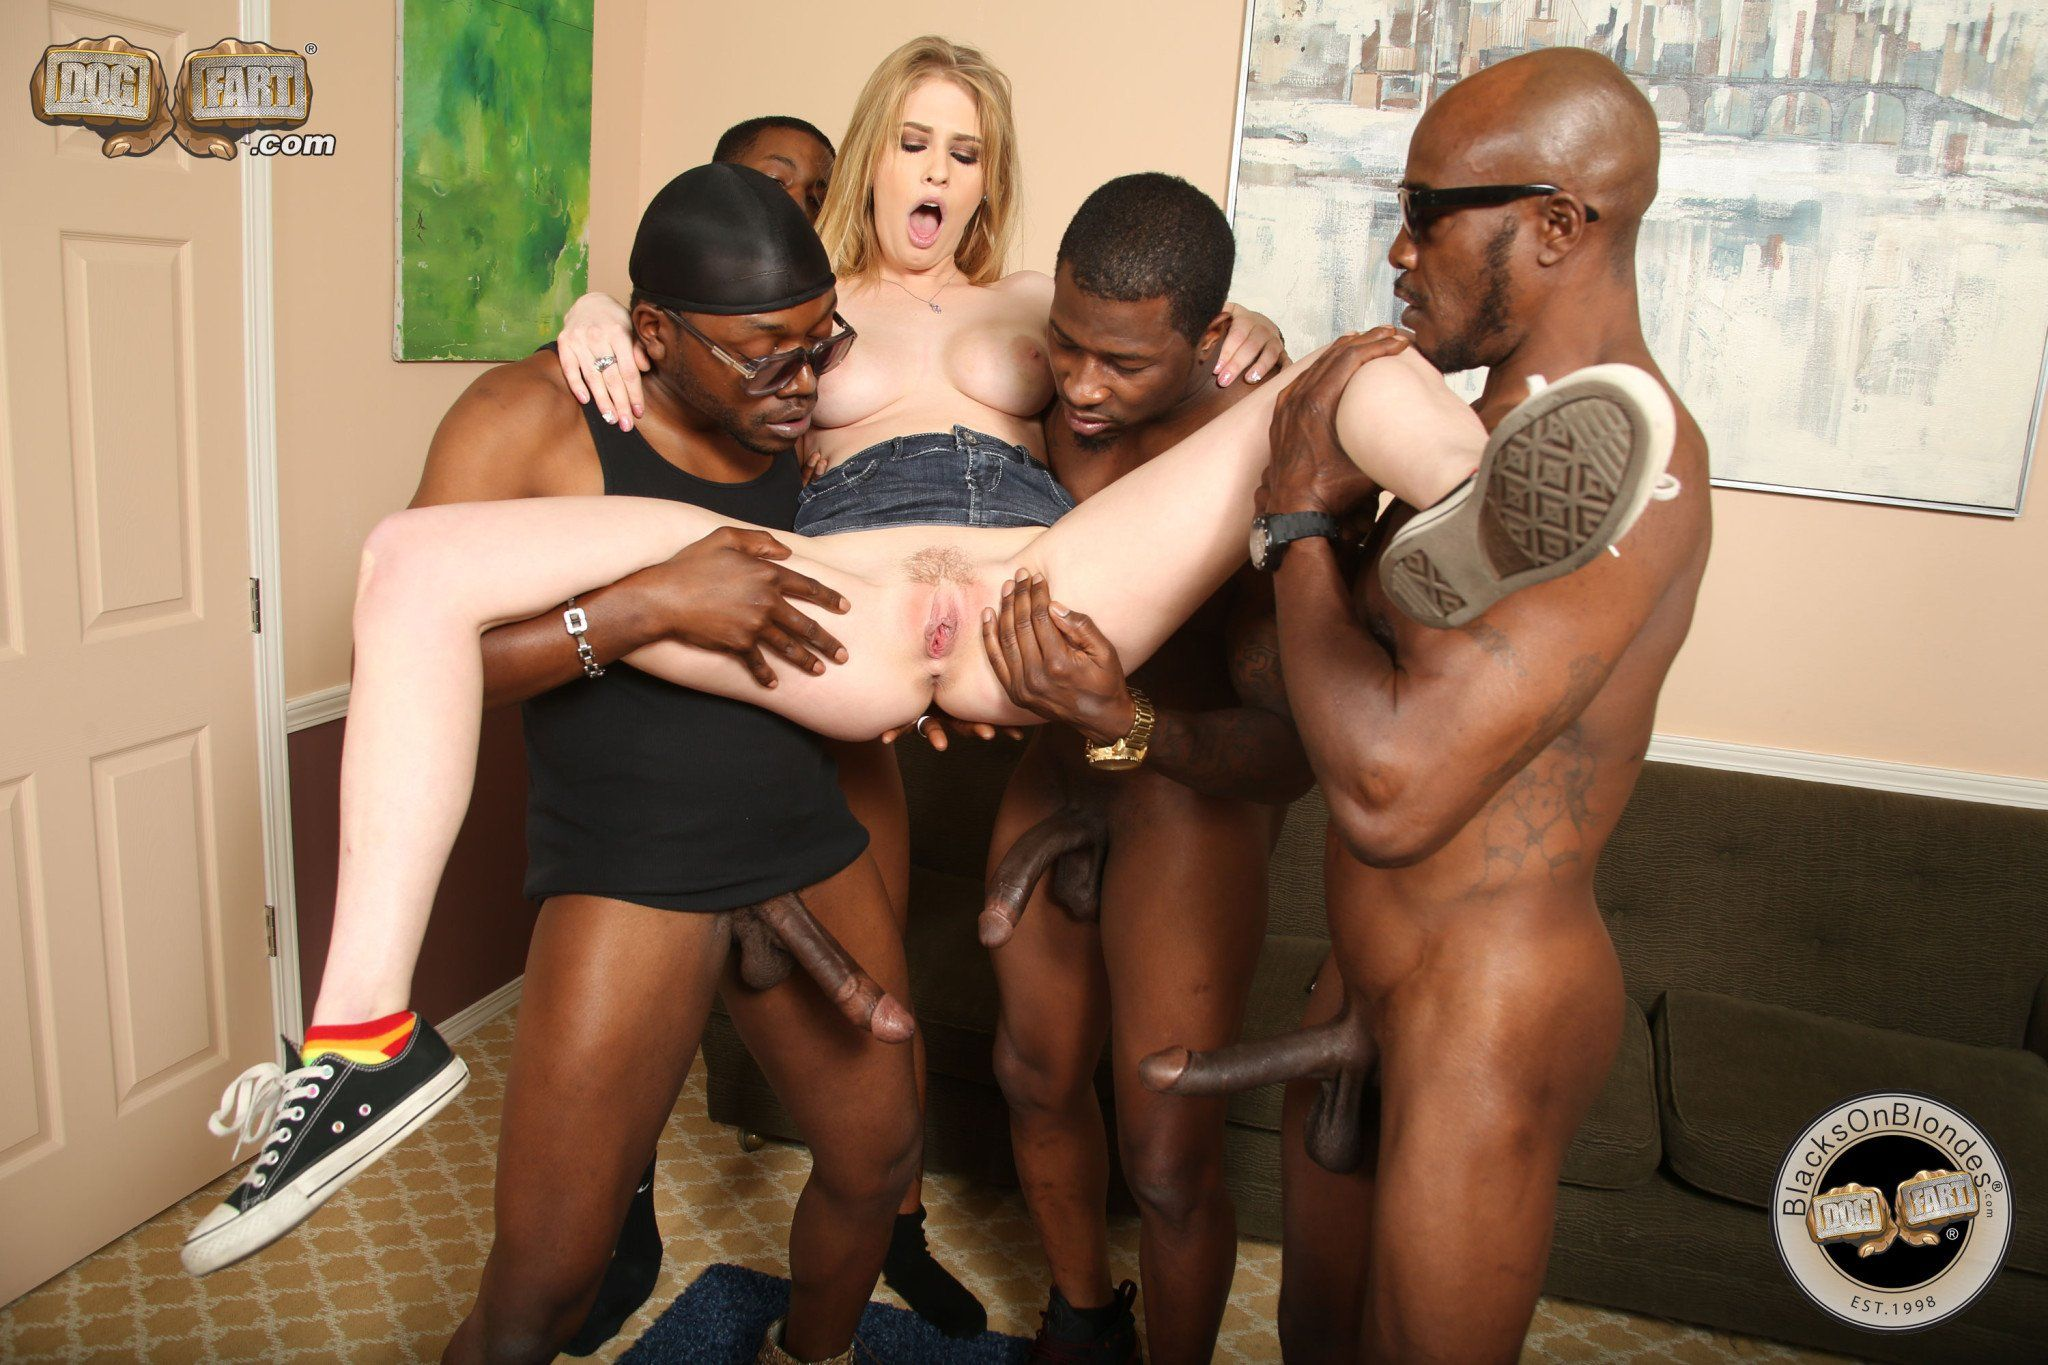 Allie James Femdom Porn interracial gangbang with allie james - photos and other